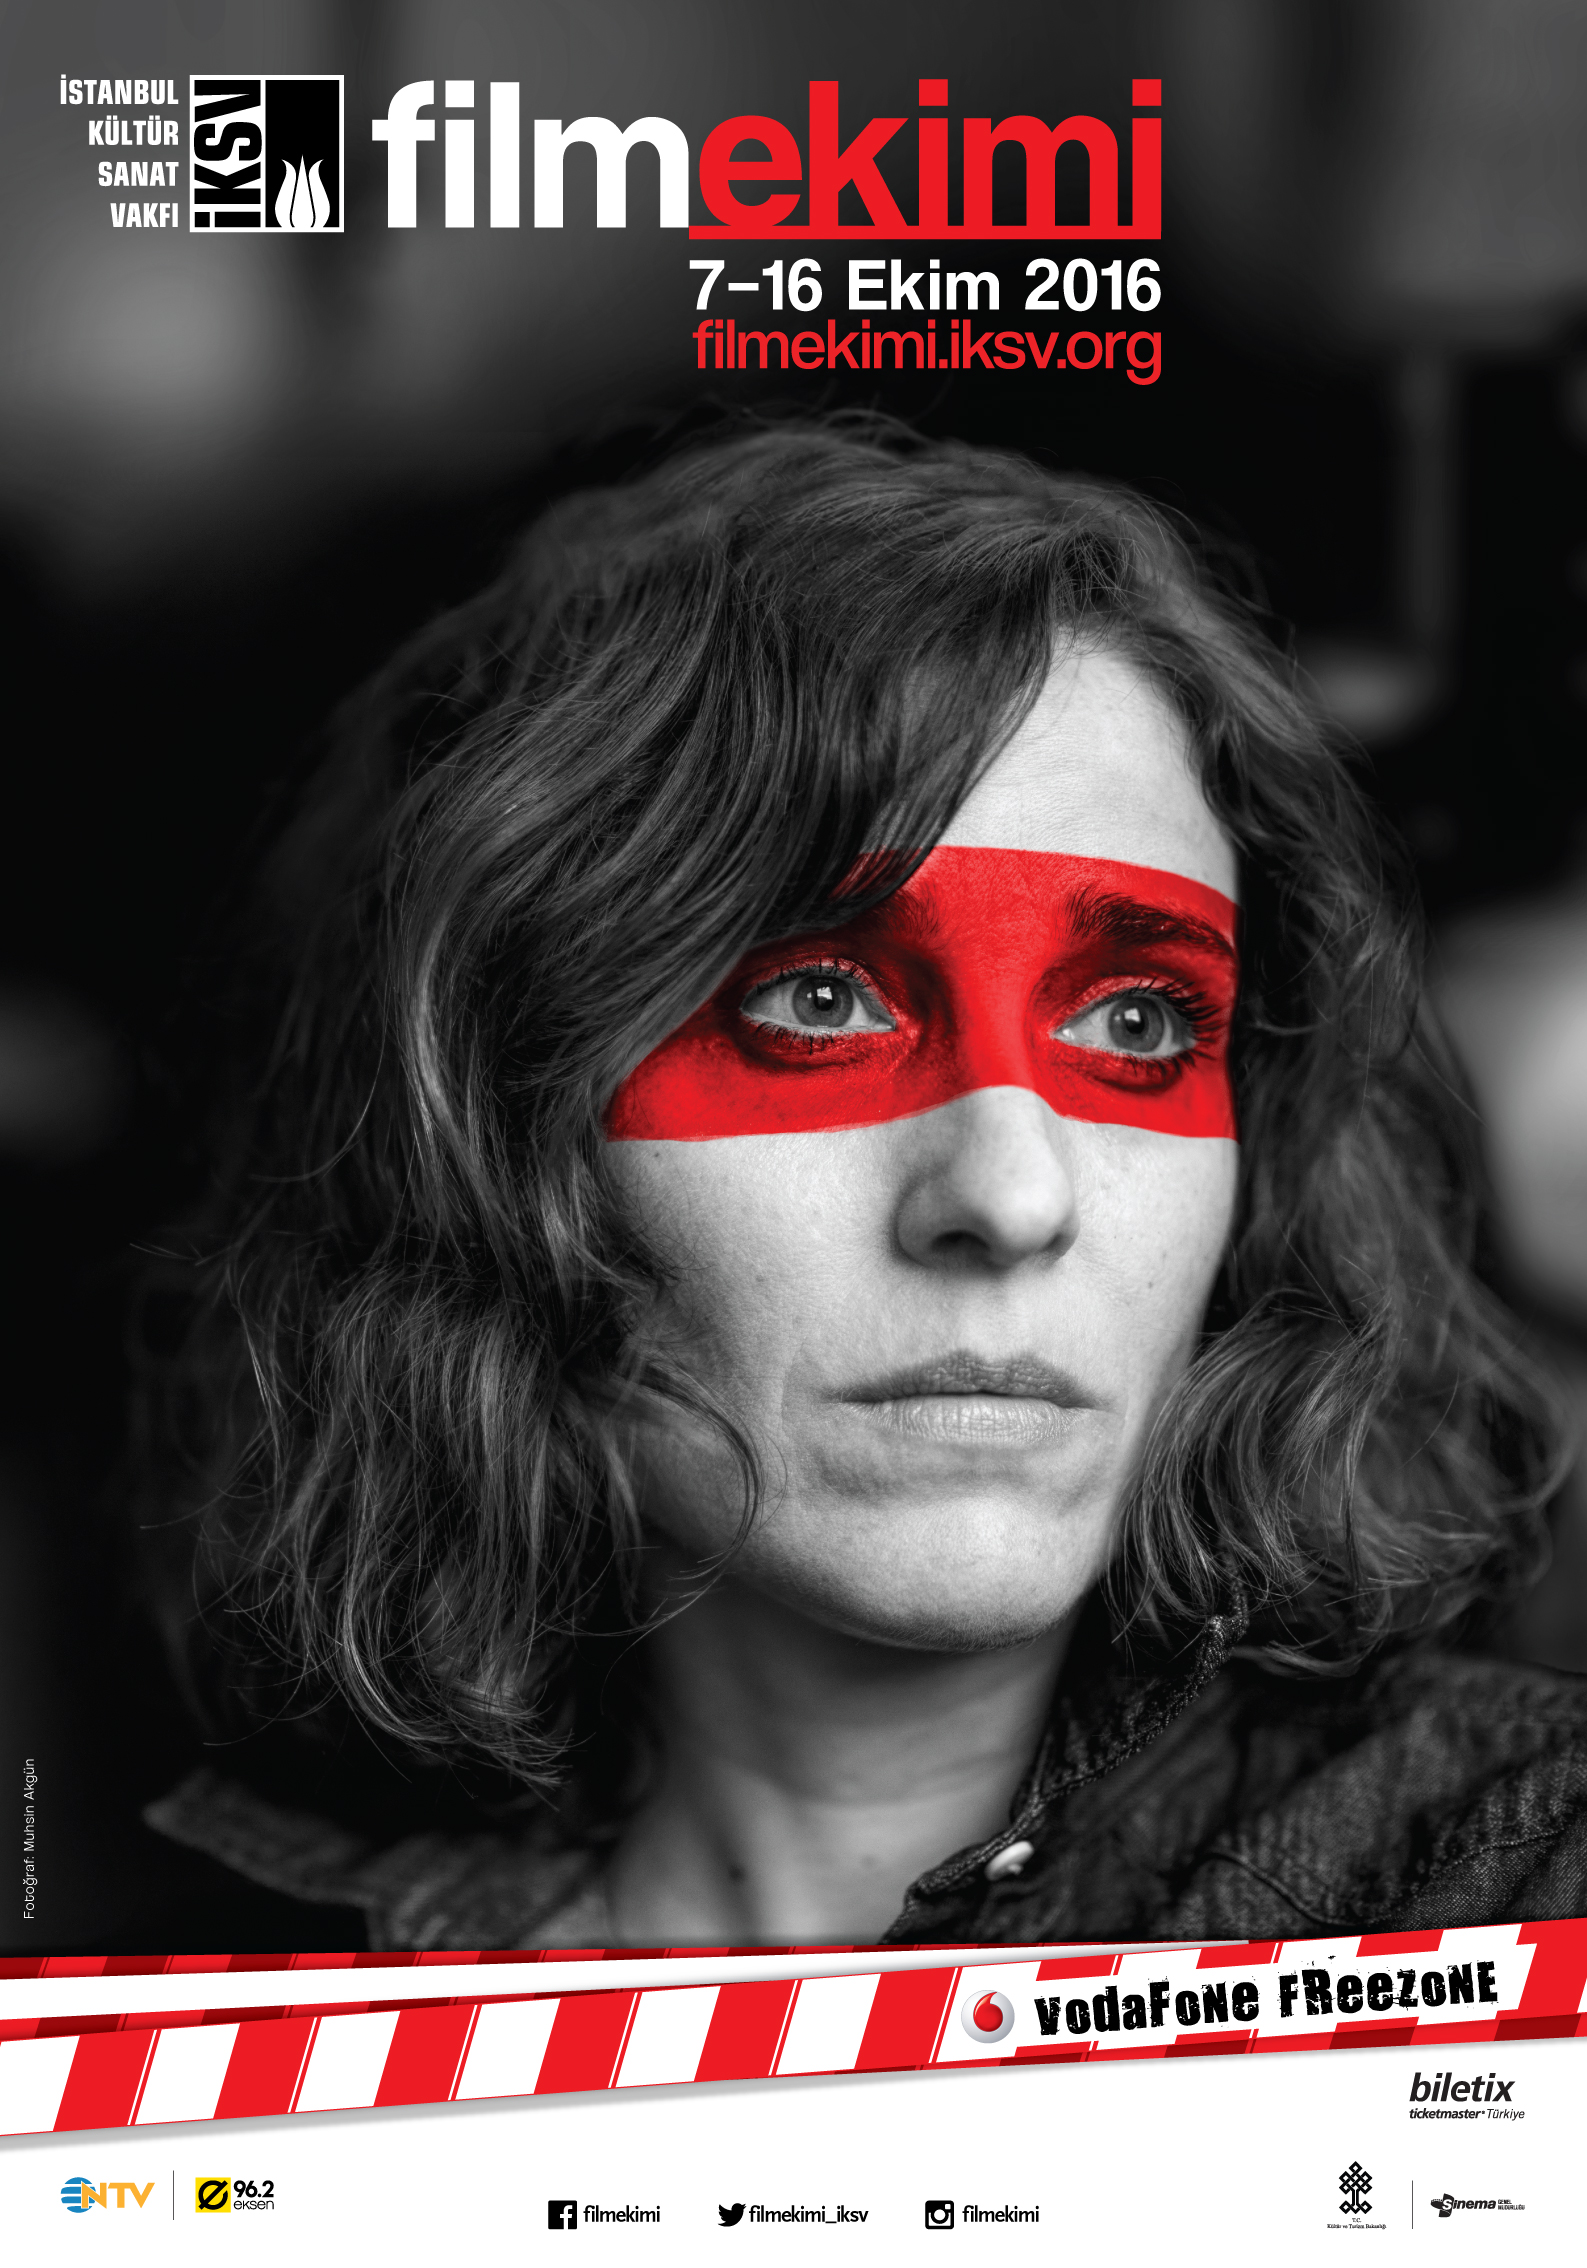 filmekimi-poster-1